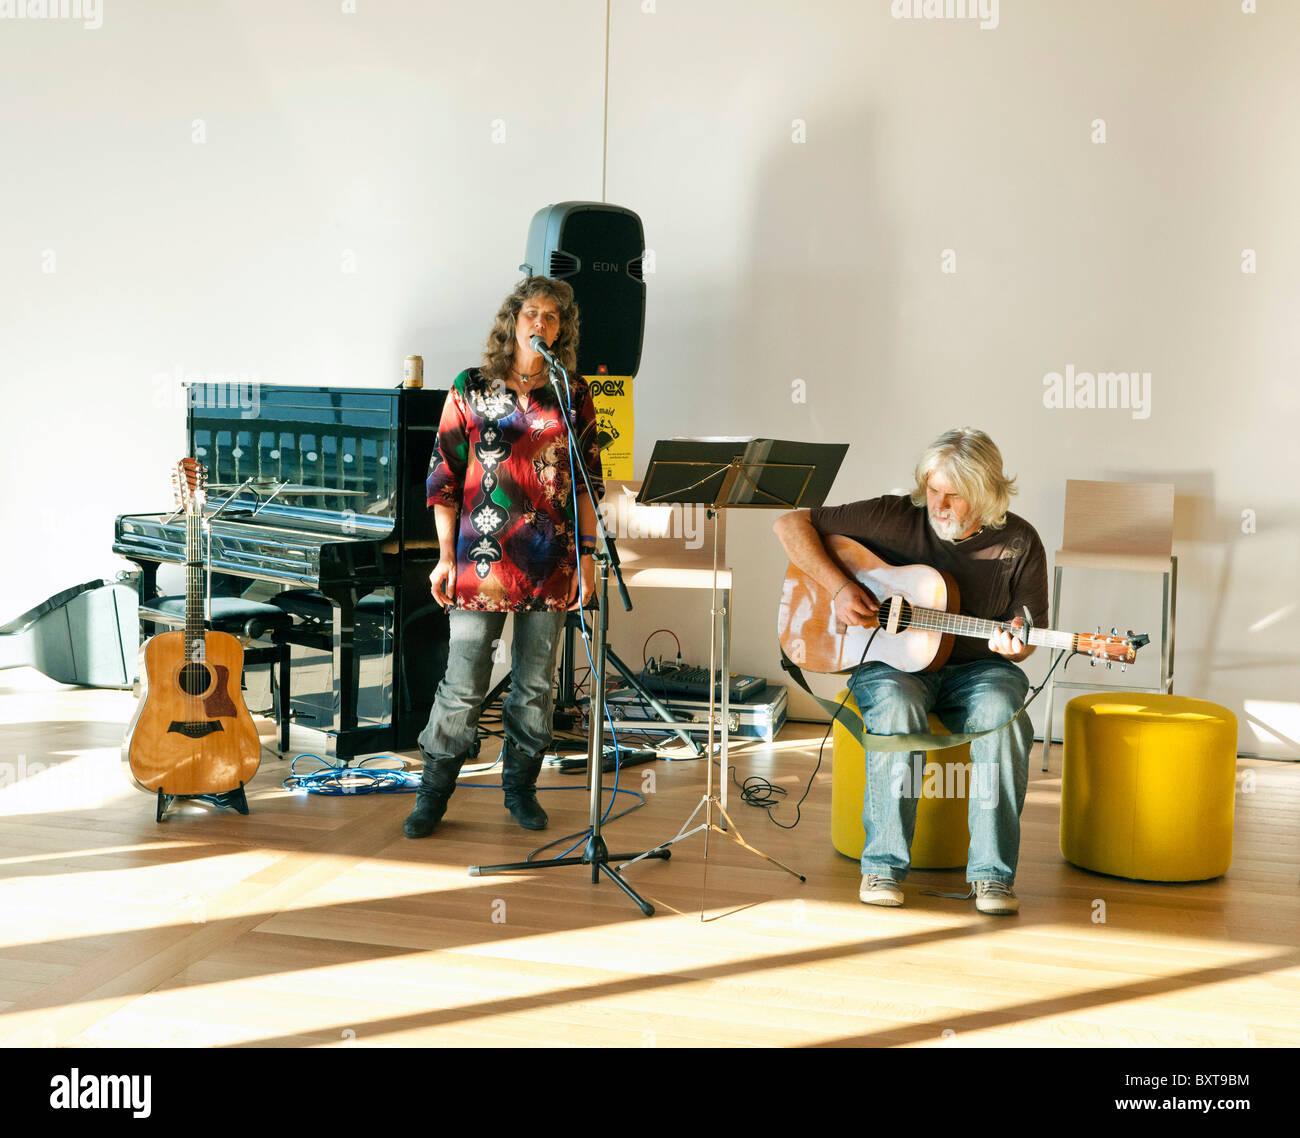 live band playing - Stock Image